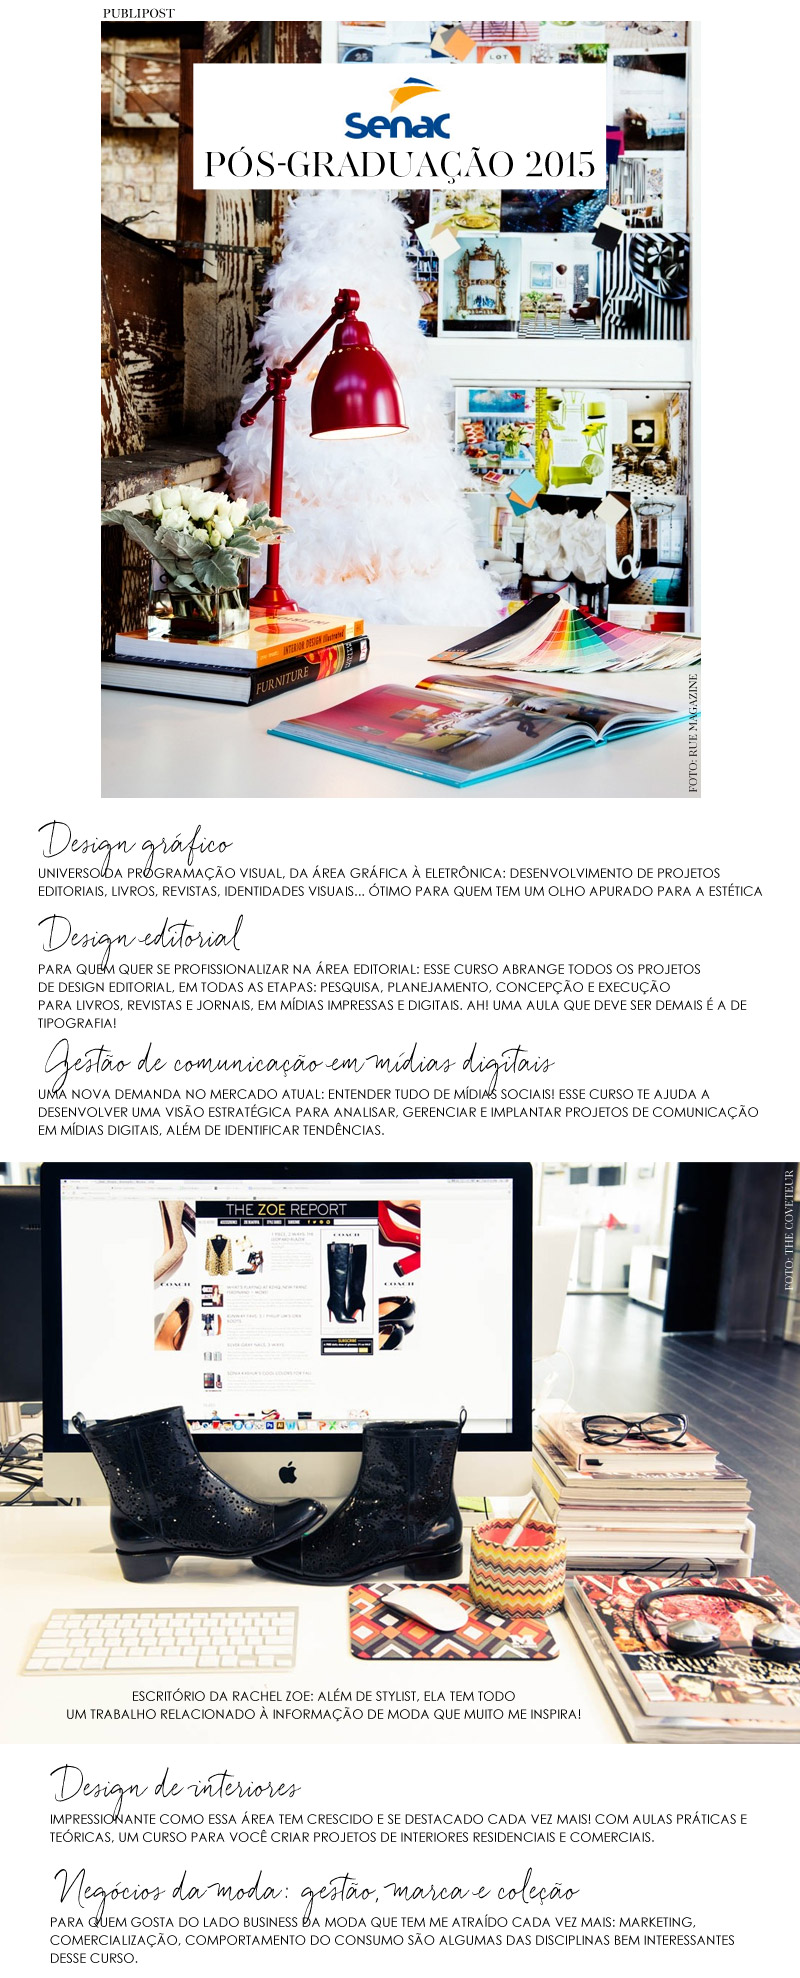 living-gazette-barbara-resende-mix-cursos-design-pos-graduacao-senac-2015